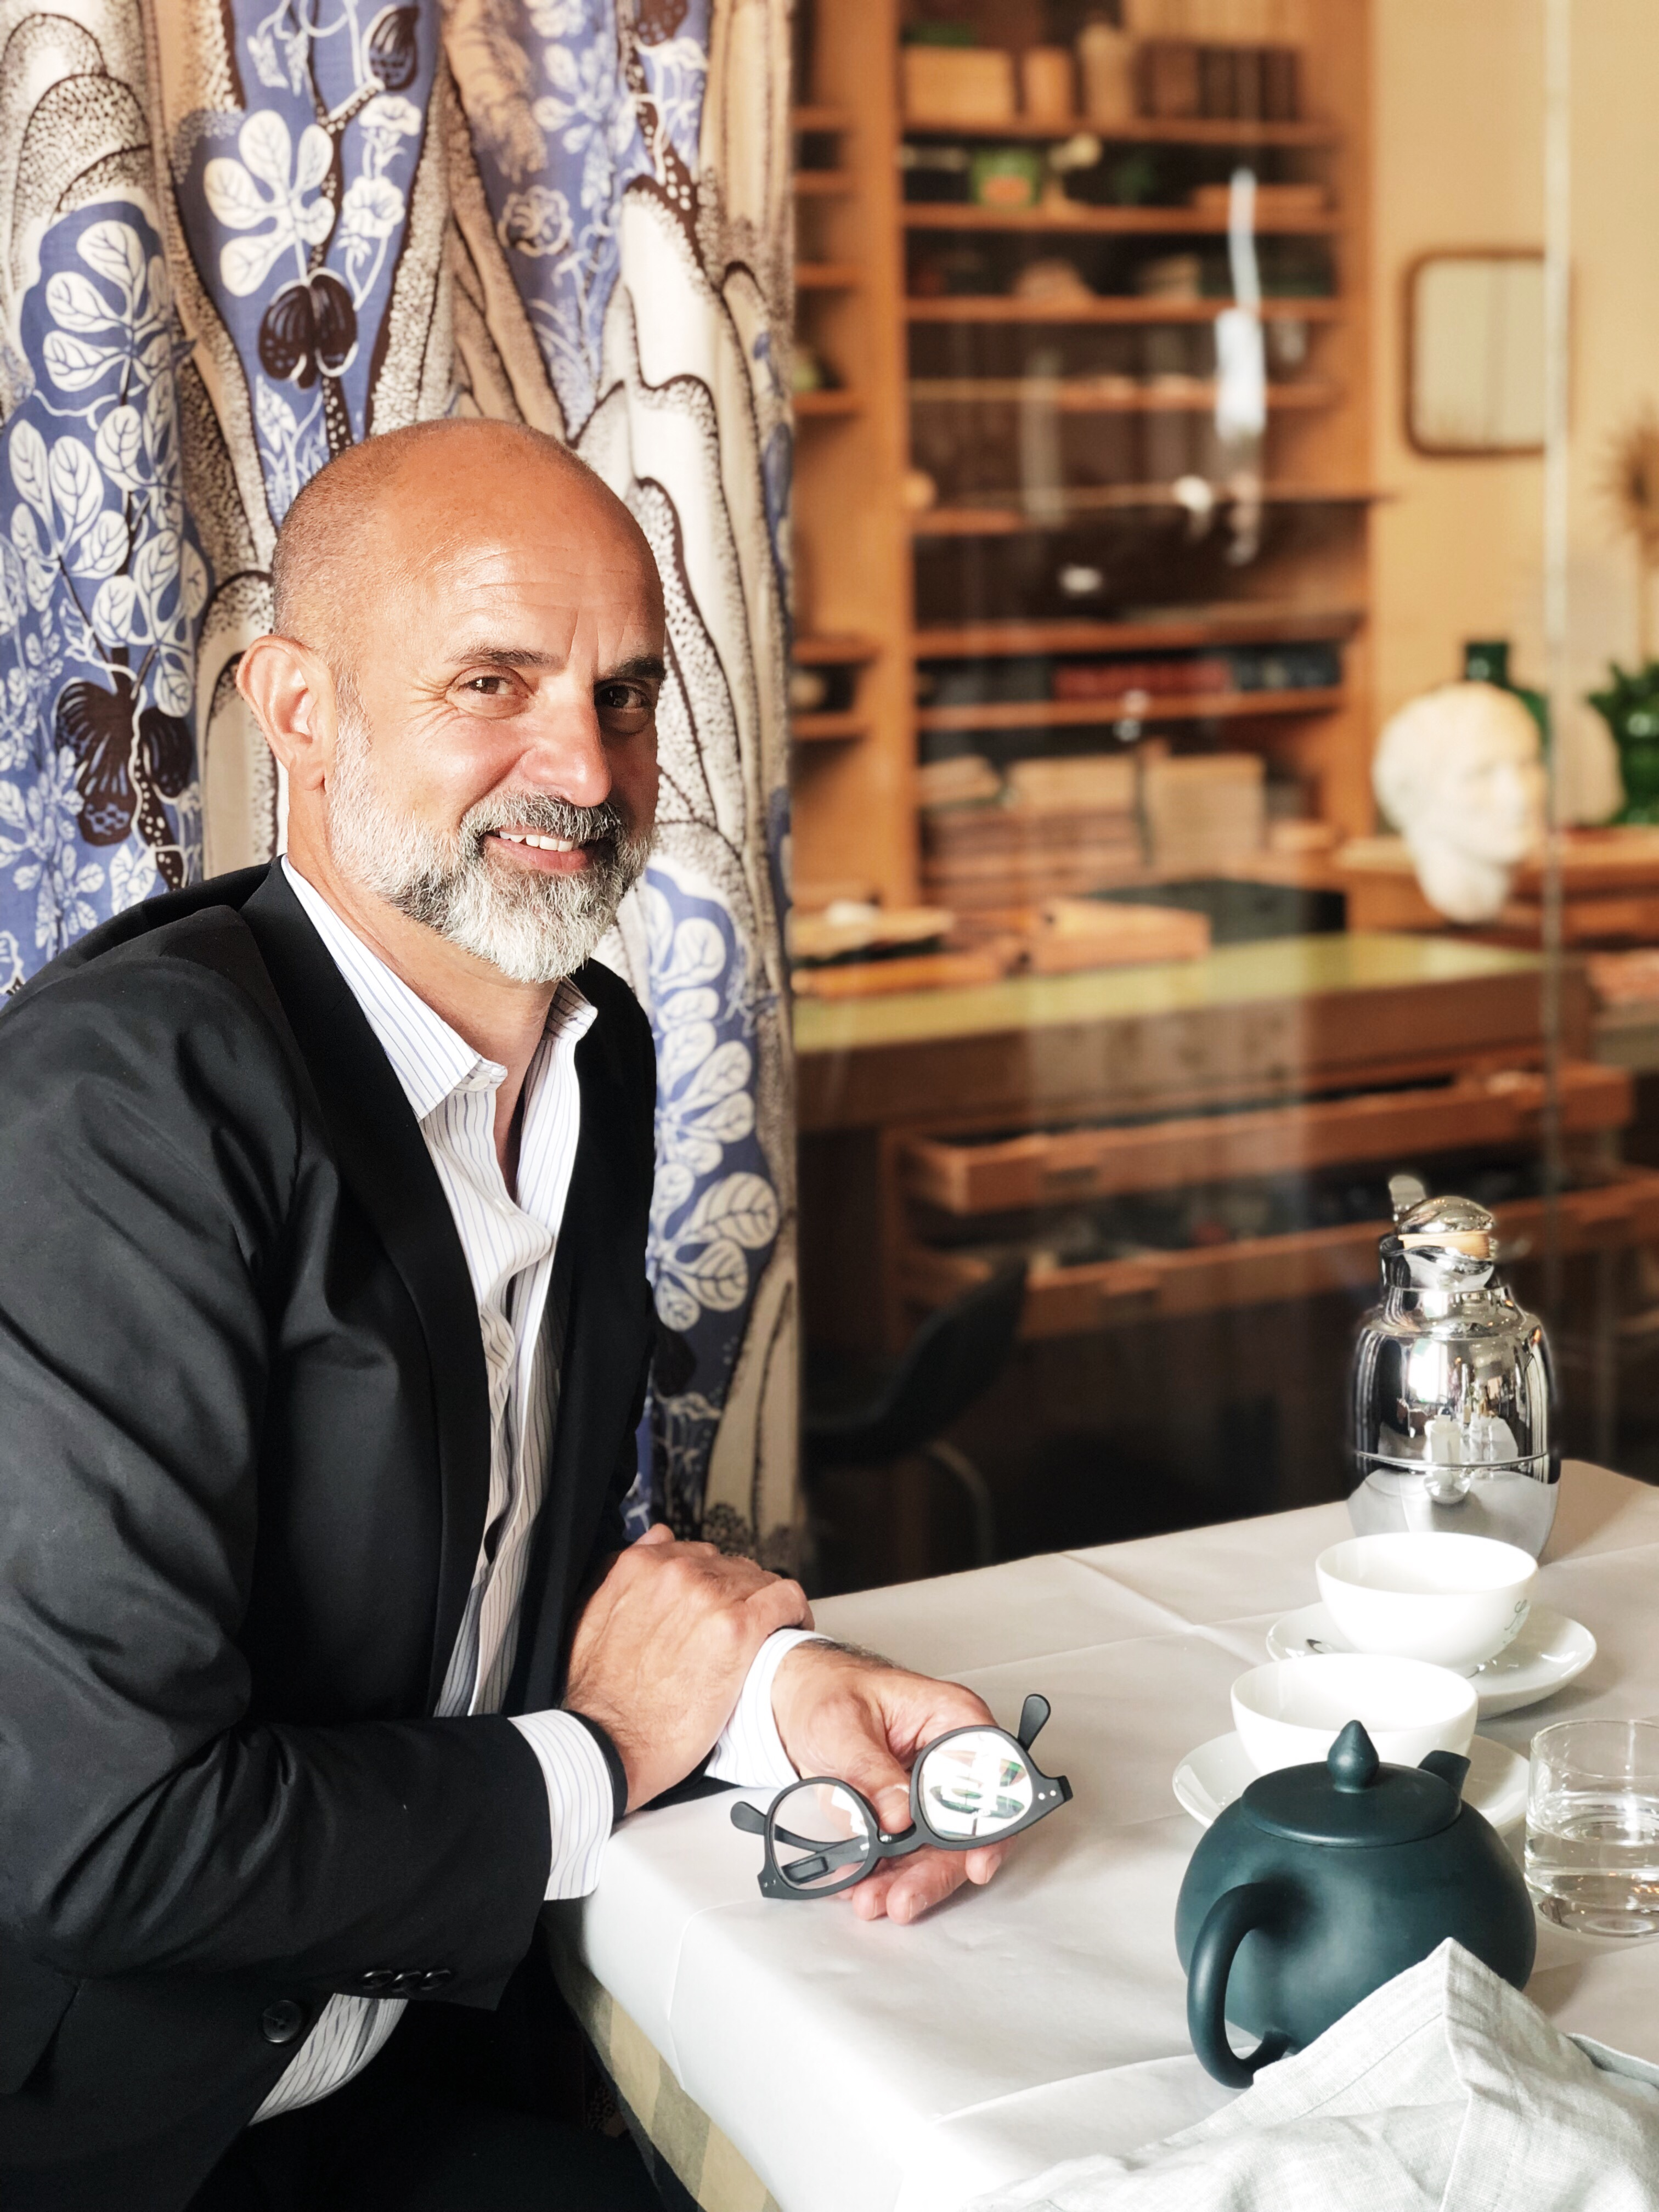 Inredningspodden möter Thommy Bindefeld, Svenskt Tenn